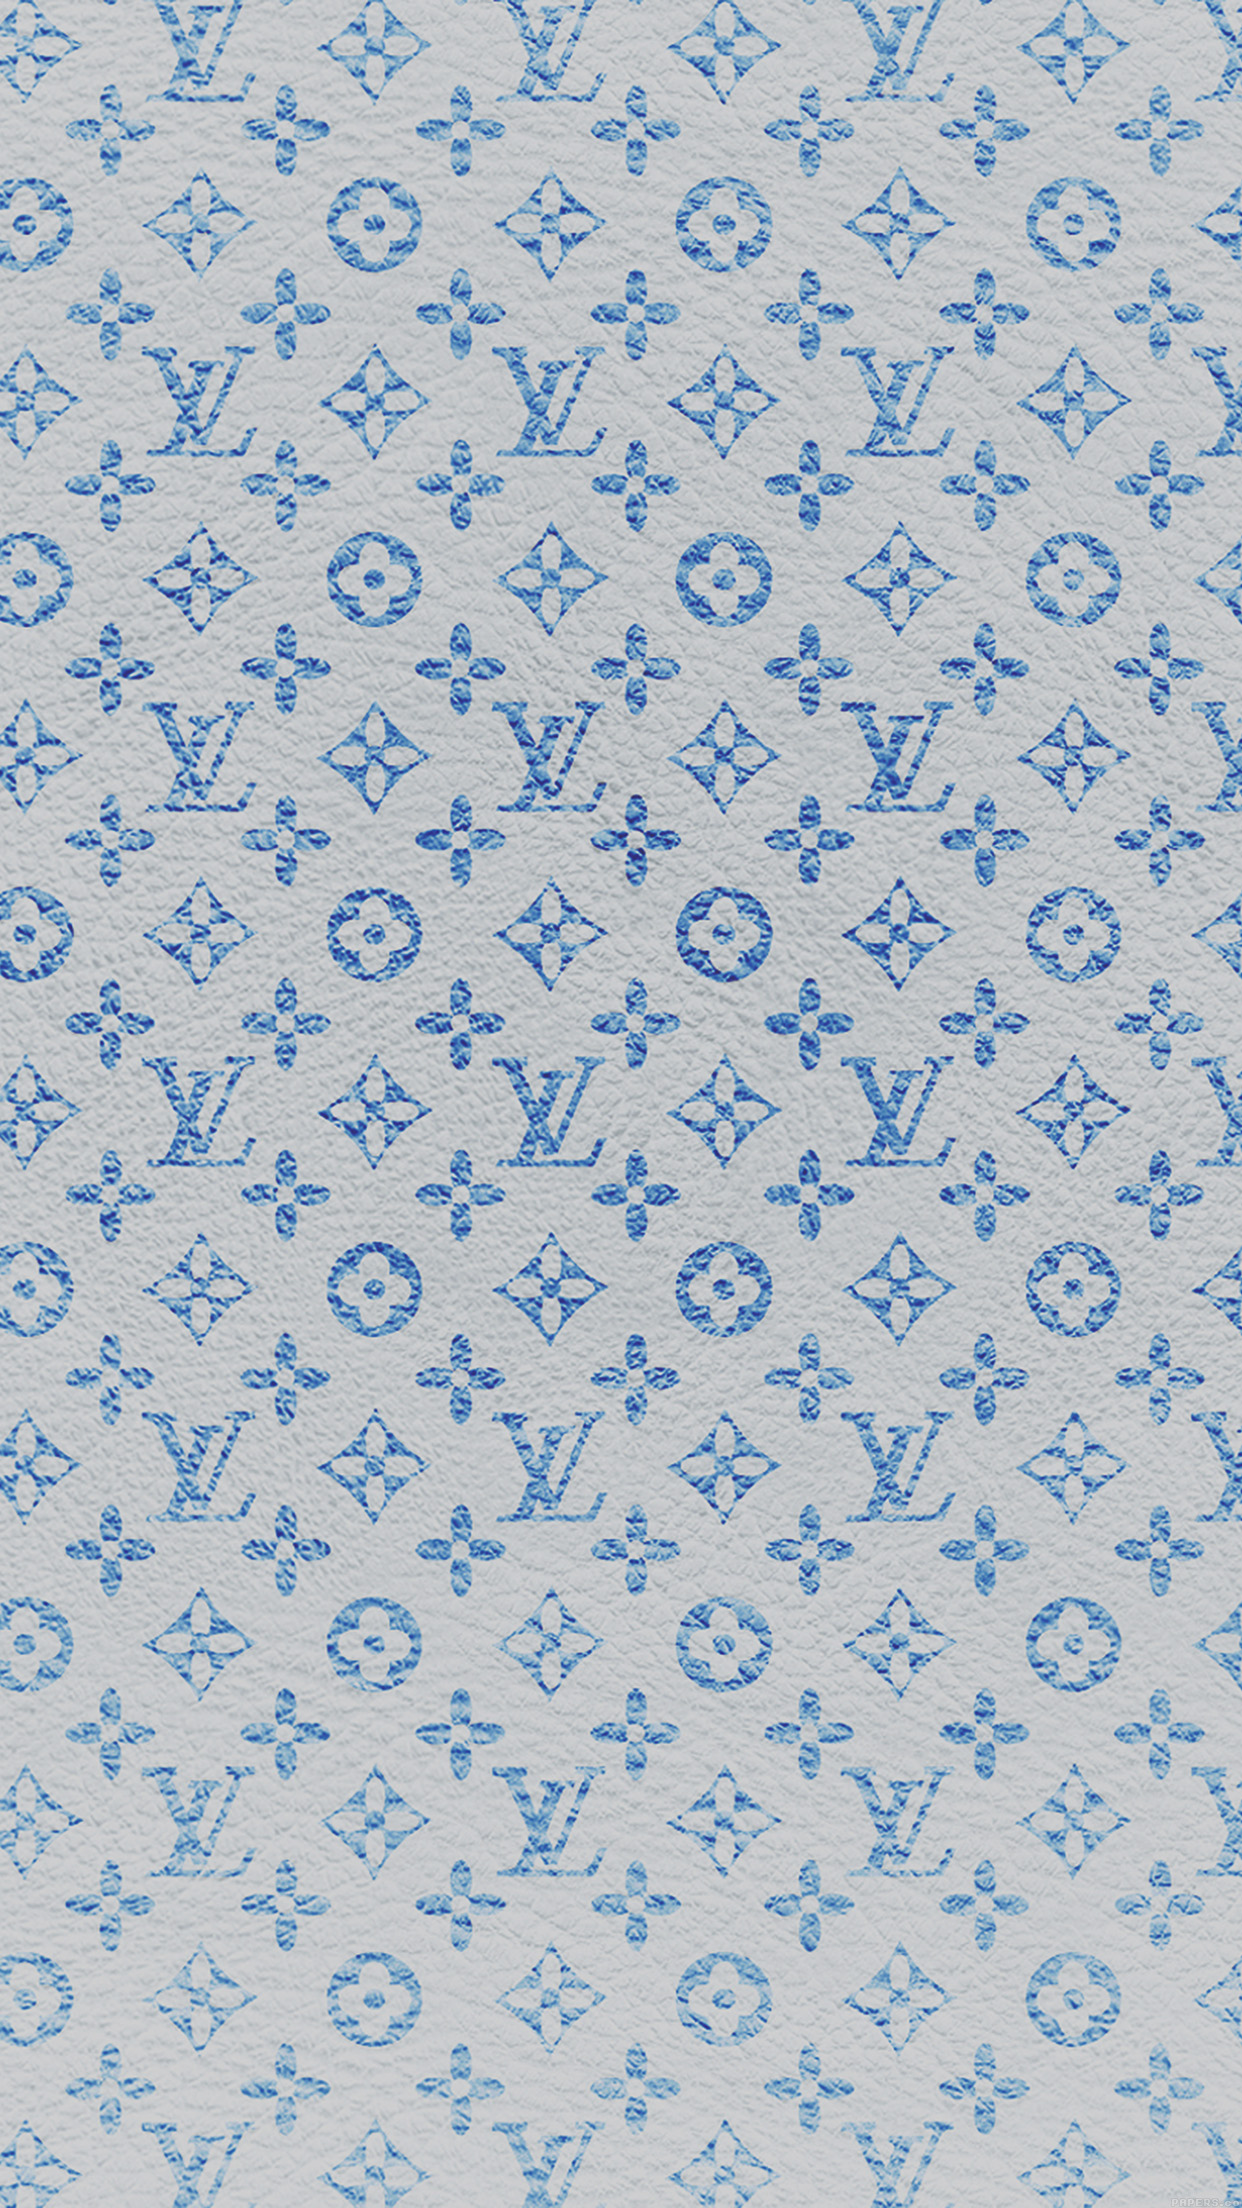 Burberry Wallpaper Iphone X Iphone Se